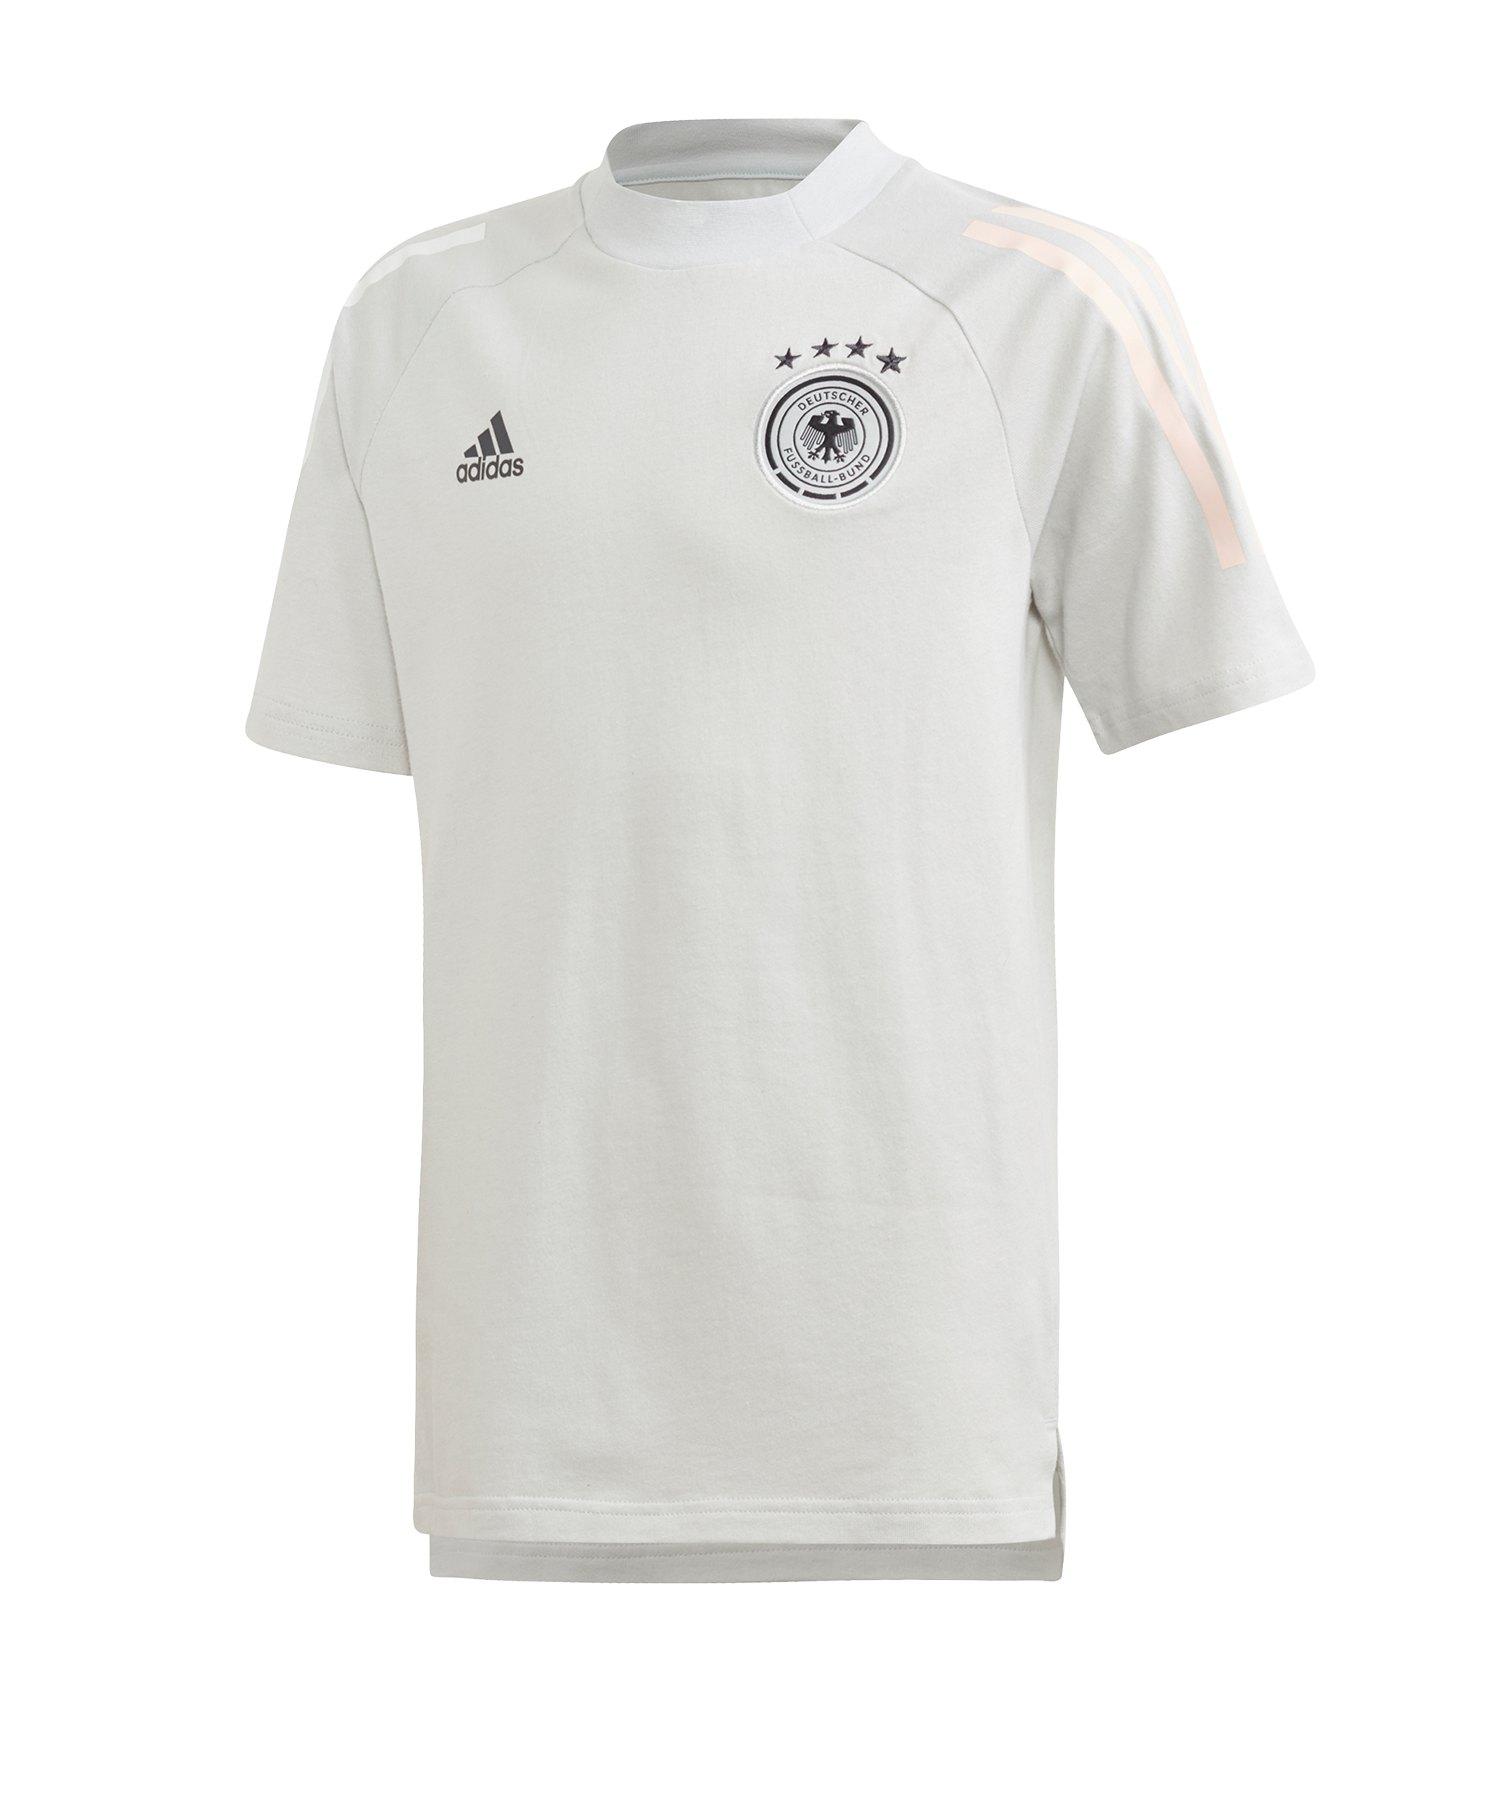 adidas DFB Deutschland Tee T-Shirt Kids Hellgrau - grau